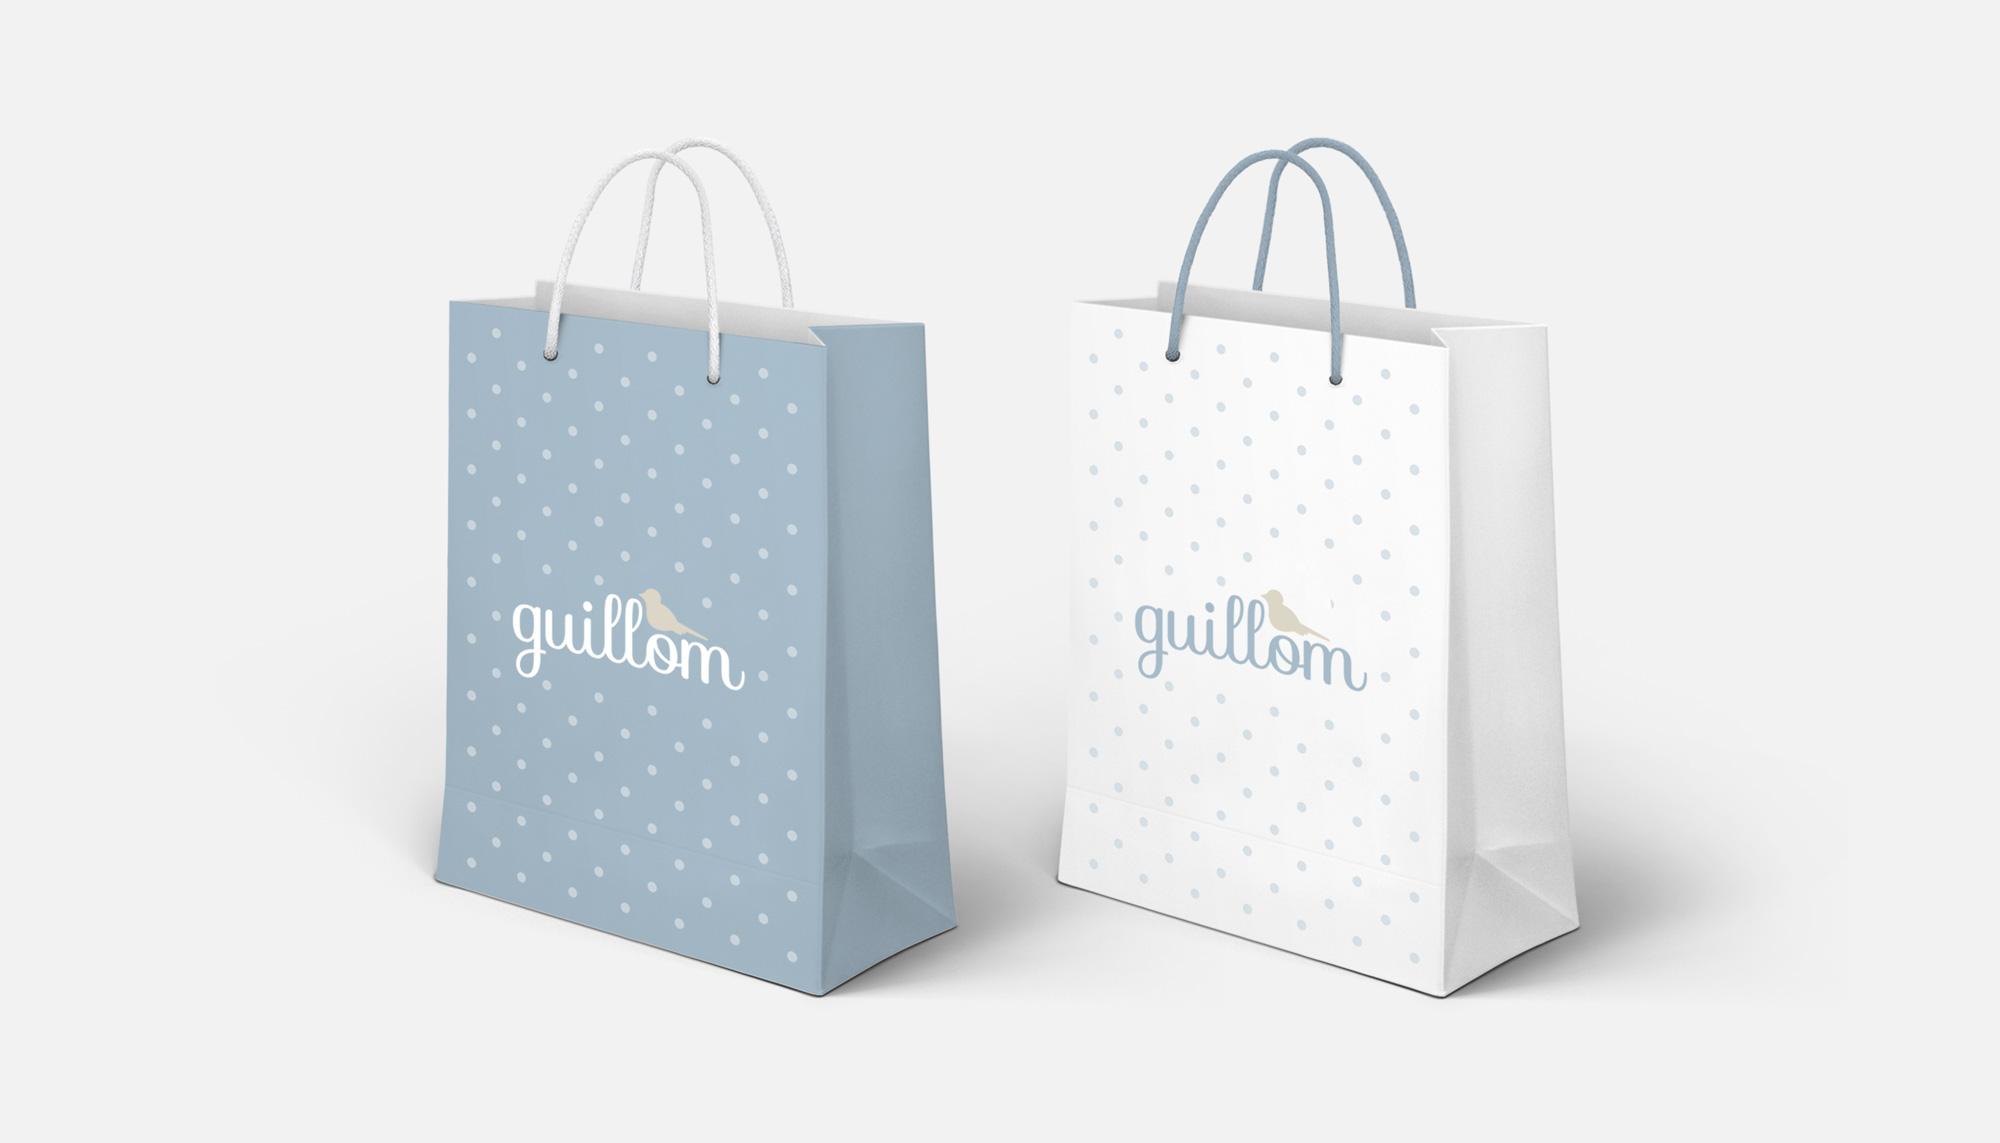 guillom-06